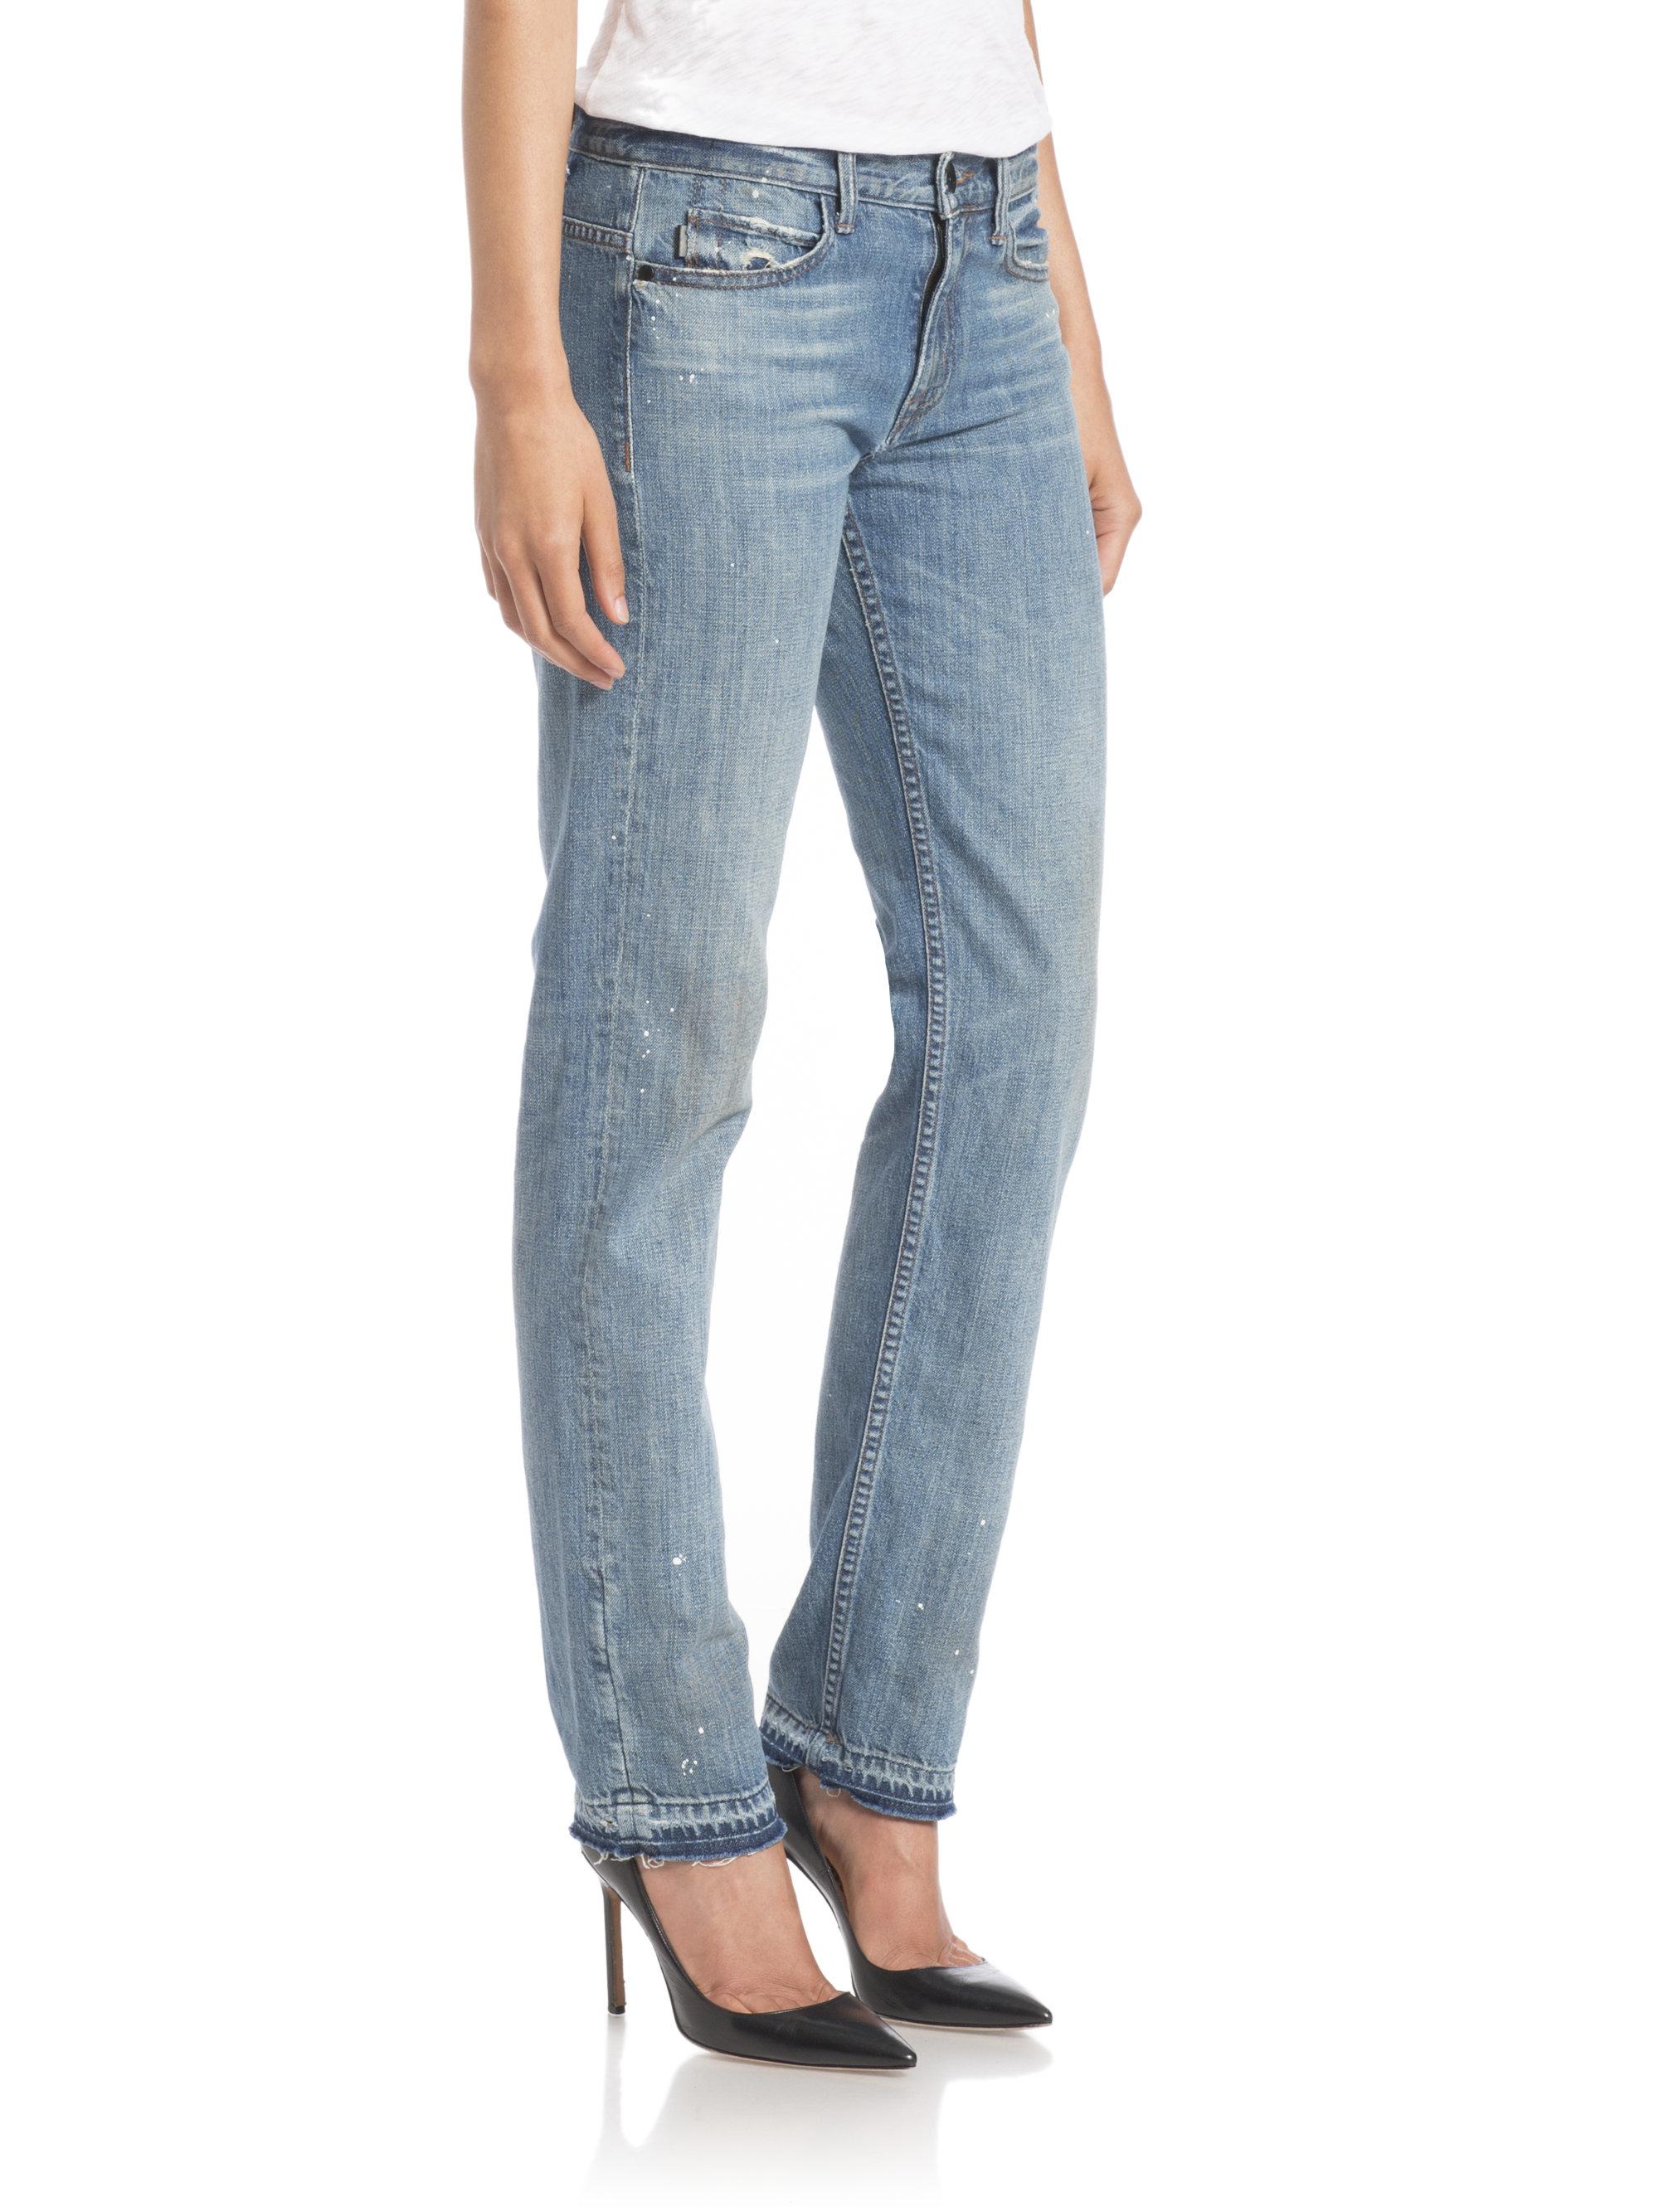 Helmut lang Distressed Slim-leg Jeans in Blue | Lyst